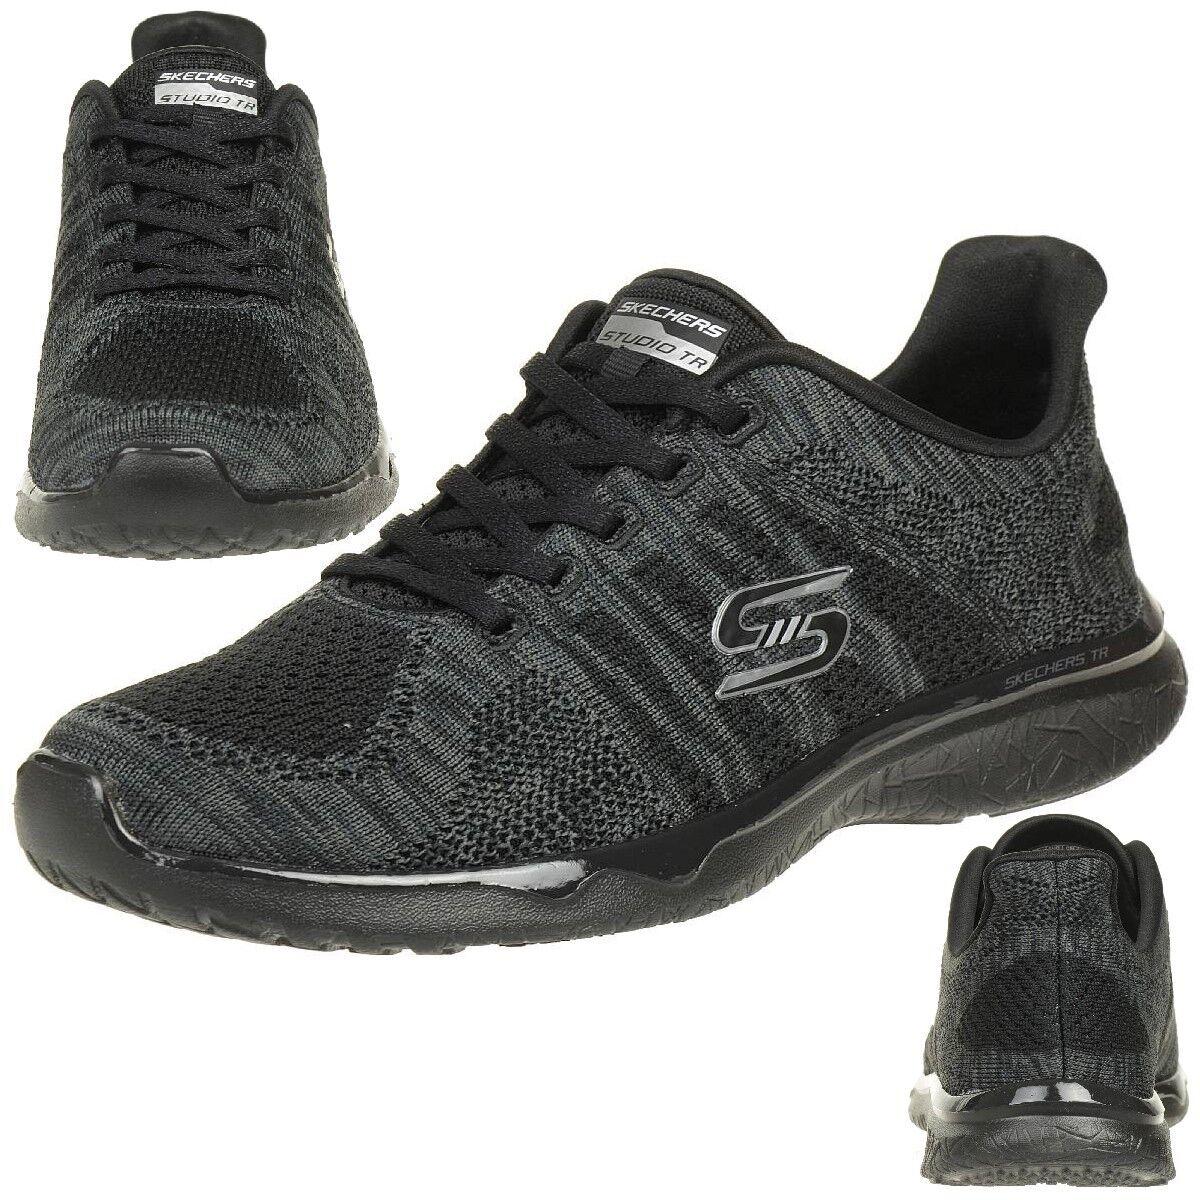 Zapatos promocionales para hombres y mujeres Skechers Studio Burst Edgy mujer Zapatos para fitness air cooled